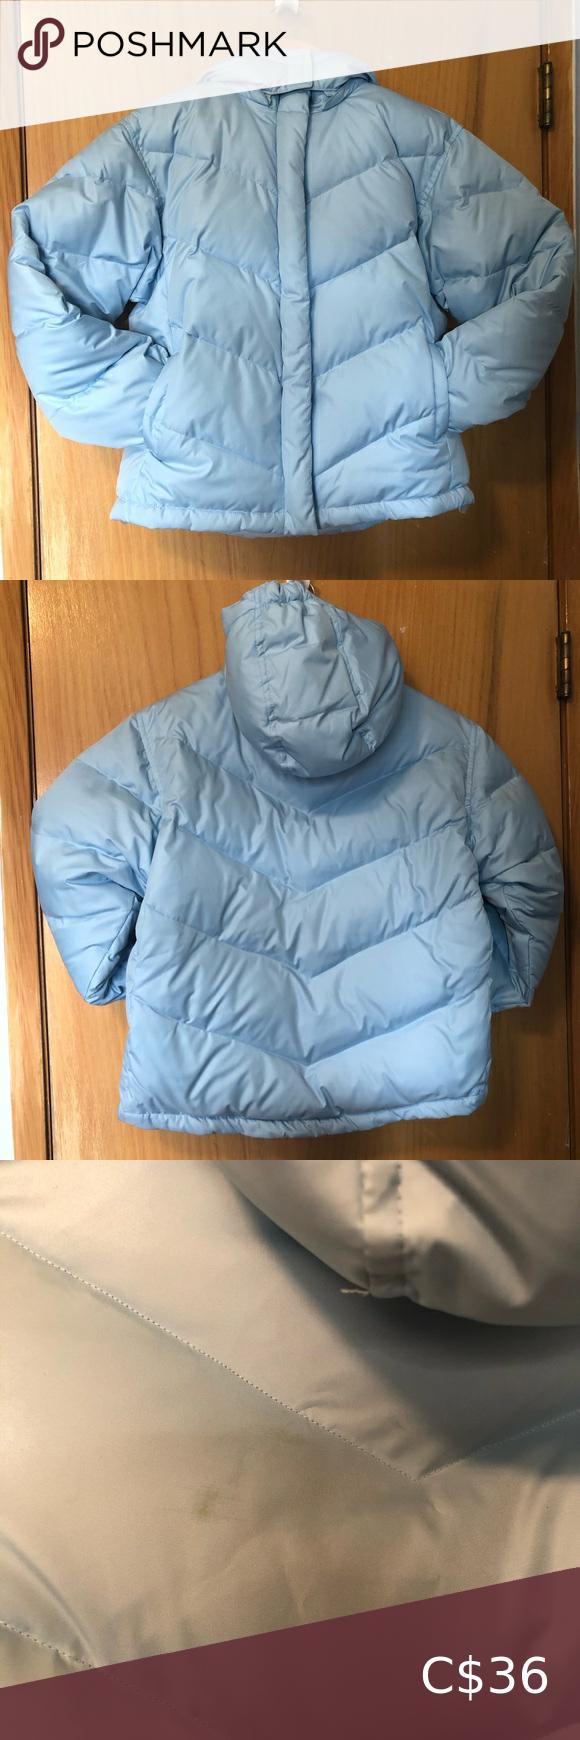 Gap Kids Puffer Jacket Light Blue Girls Winter Jacket Size Xxl Fleece Lined Light Stain On The Back As Pictured Girls Winter Jackets Kid Puffer Gap Kids [ 1740 x 580 Pixel ]